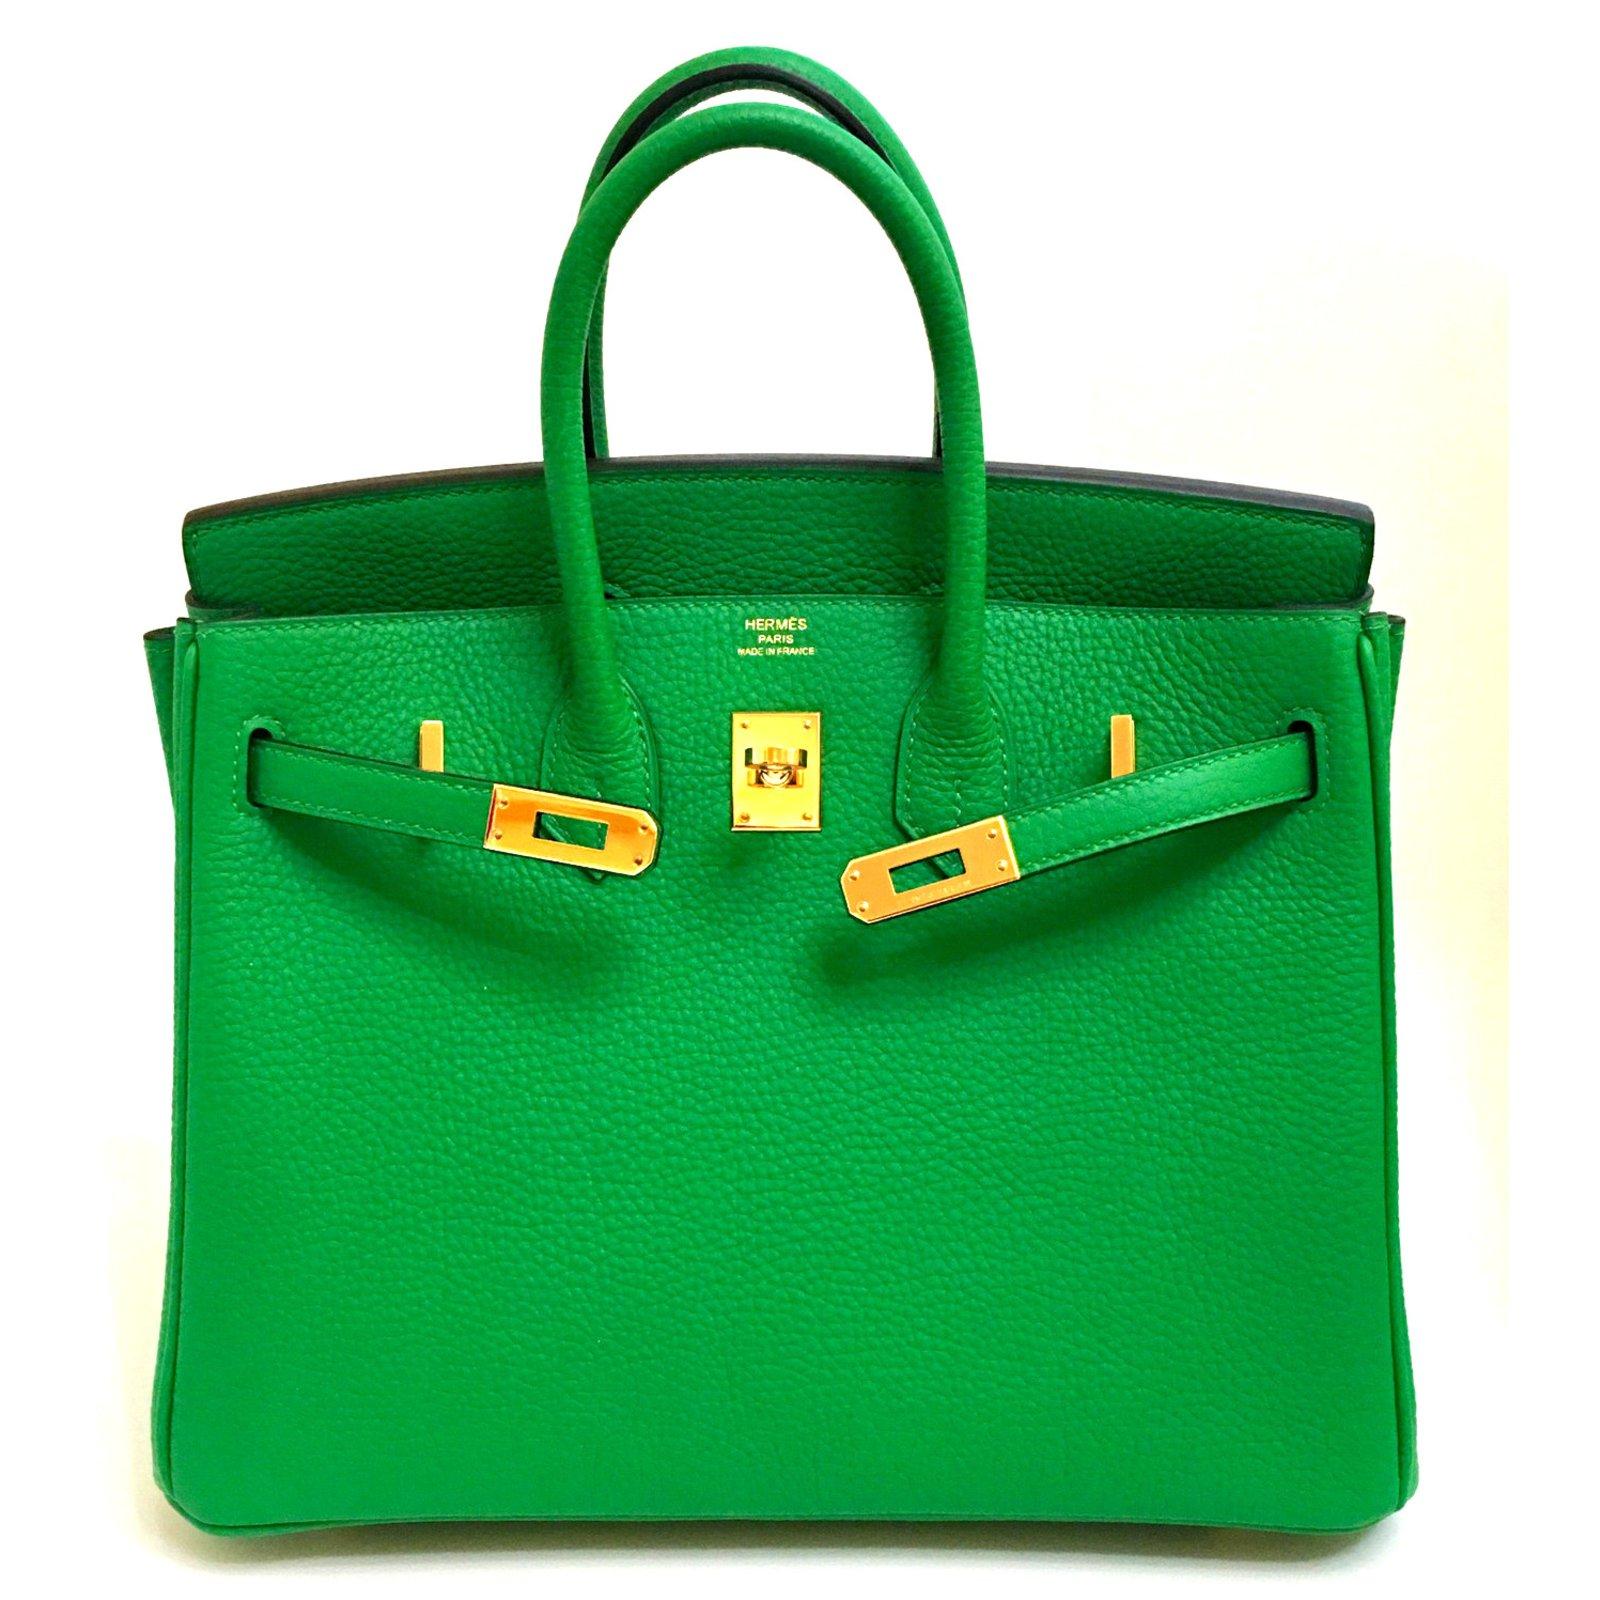 0e4eb0d27667 Hermès Hermes Birkin 25cm Bamboo Togo Leather Gold Hardware Handbags  Leather Green ref.38061 - Joli Closet